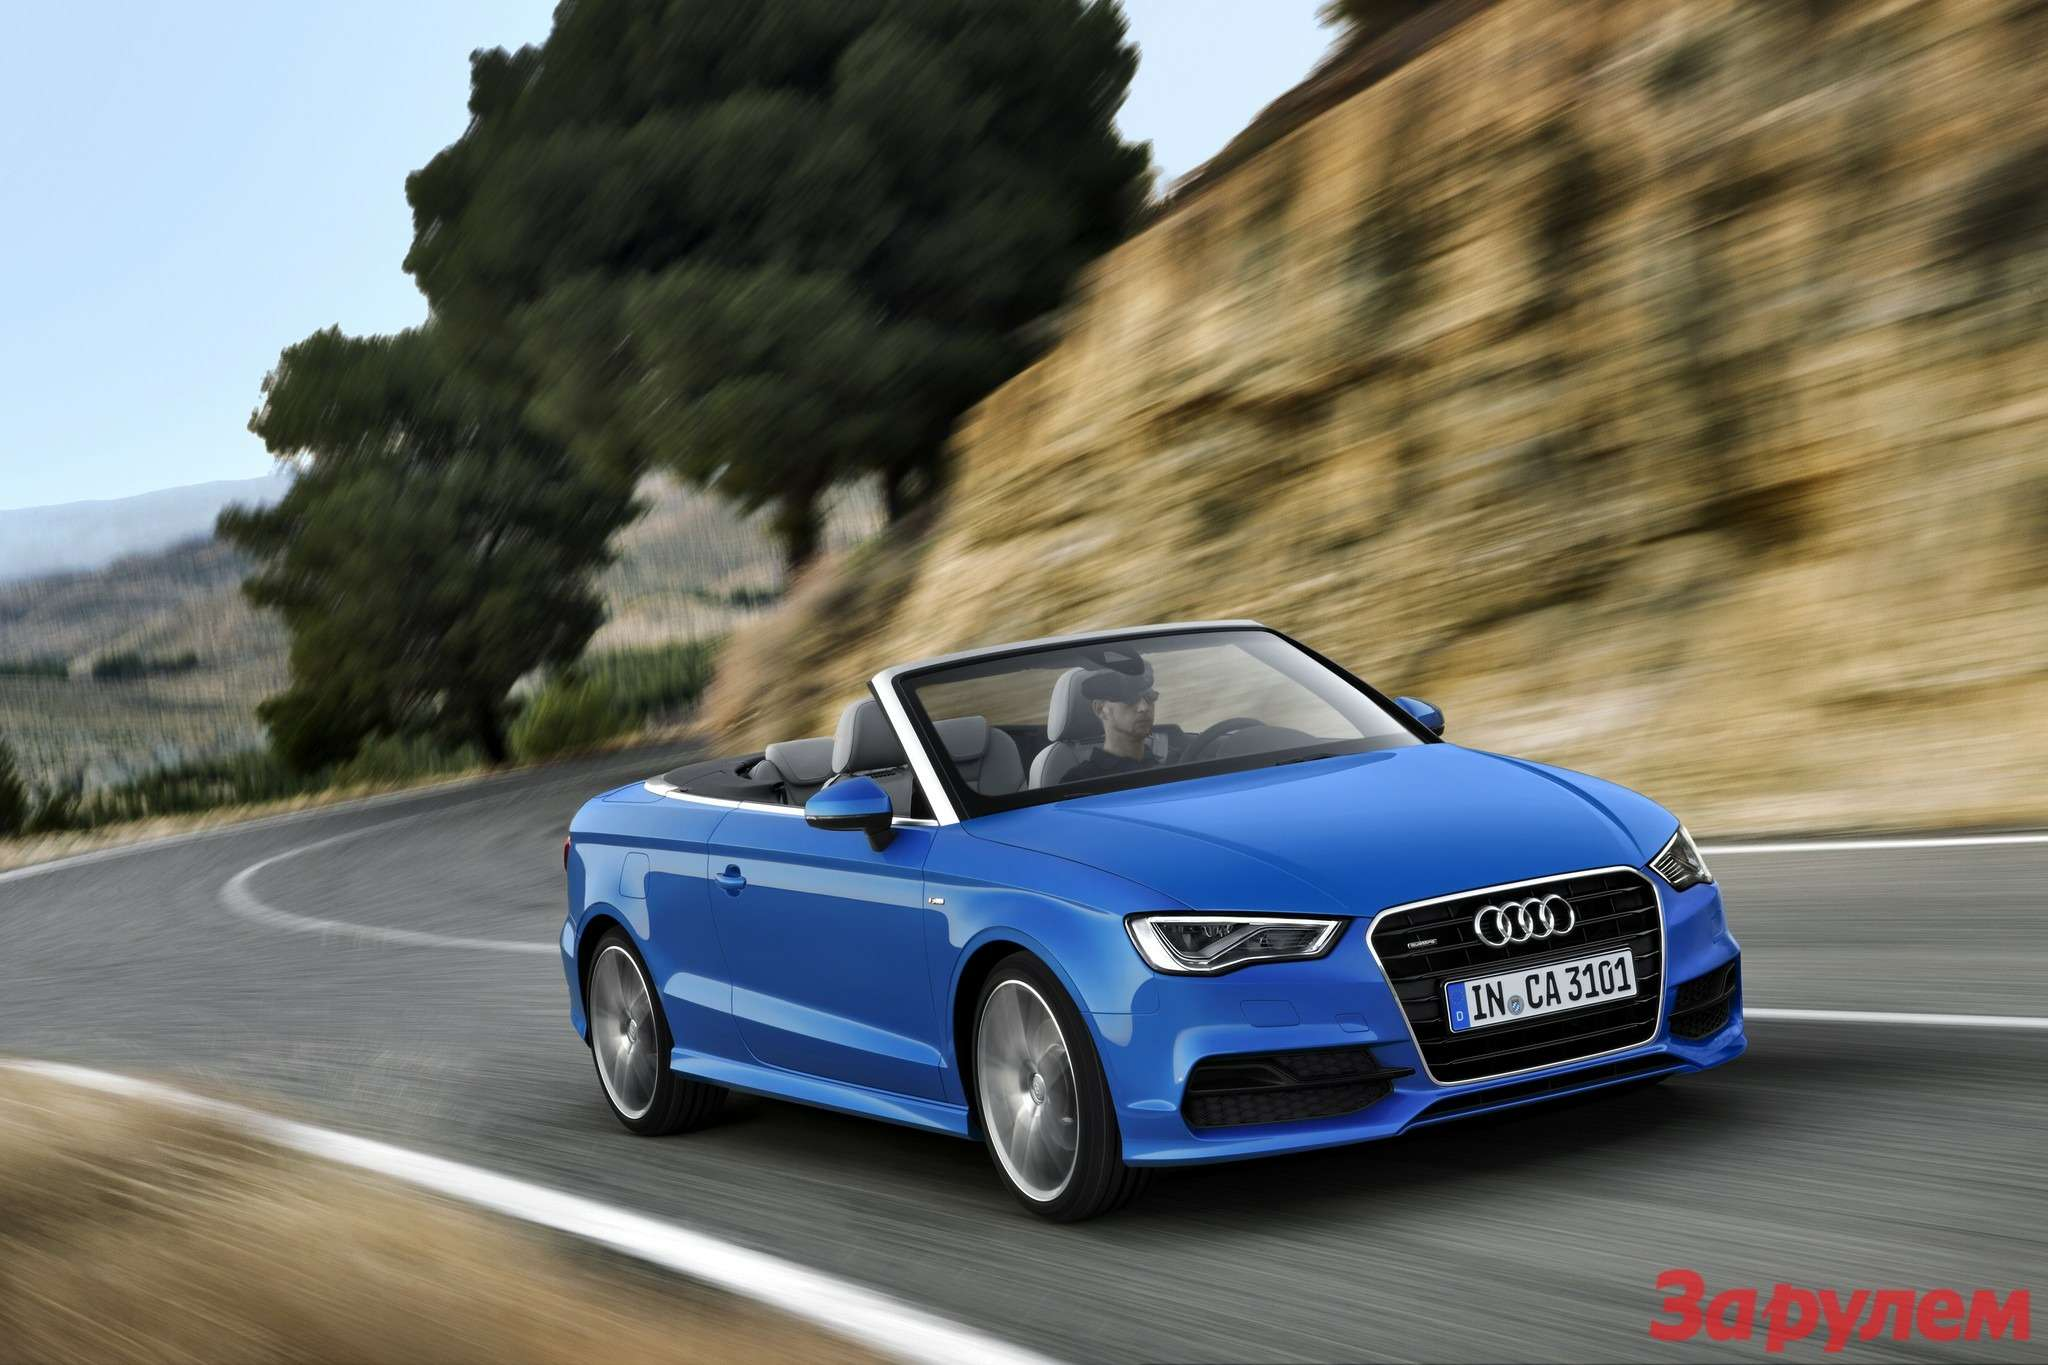 Audi A3Cabriolet 2.0 TFSI quattro